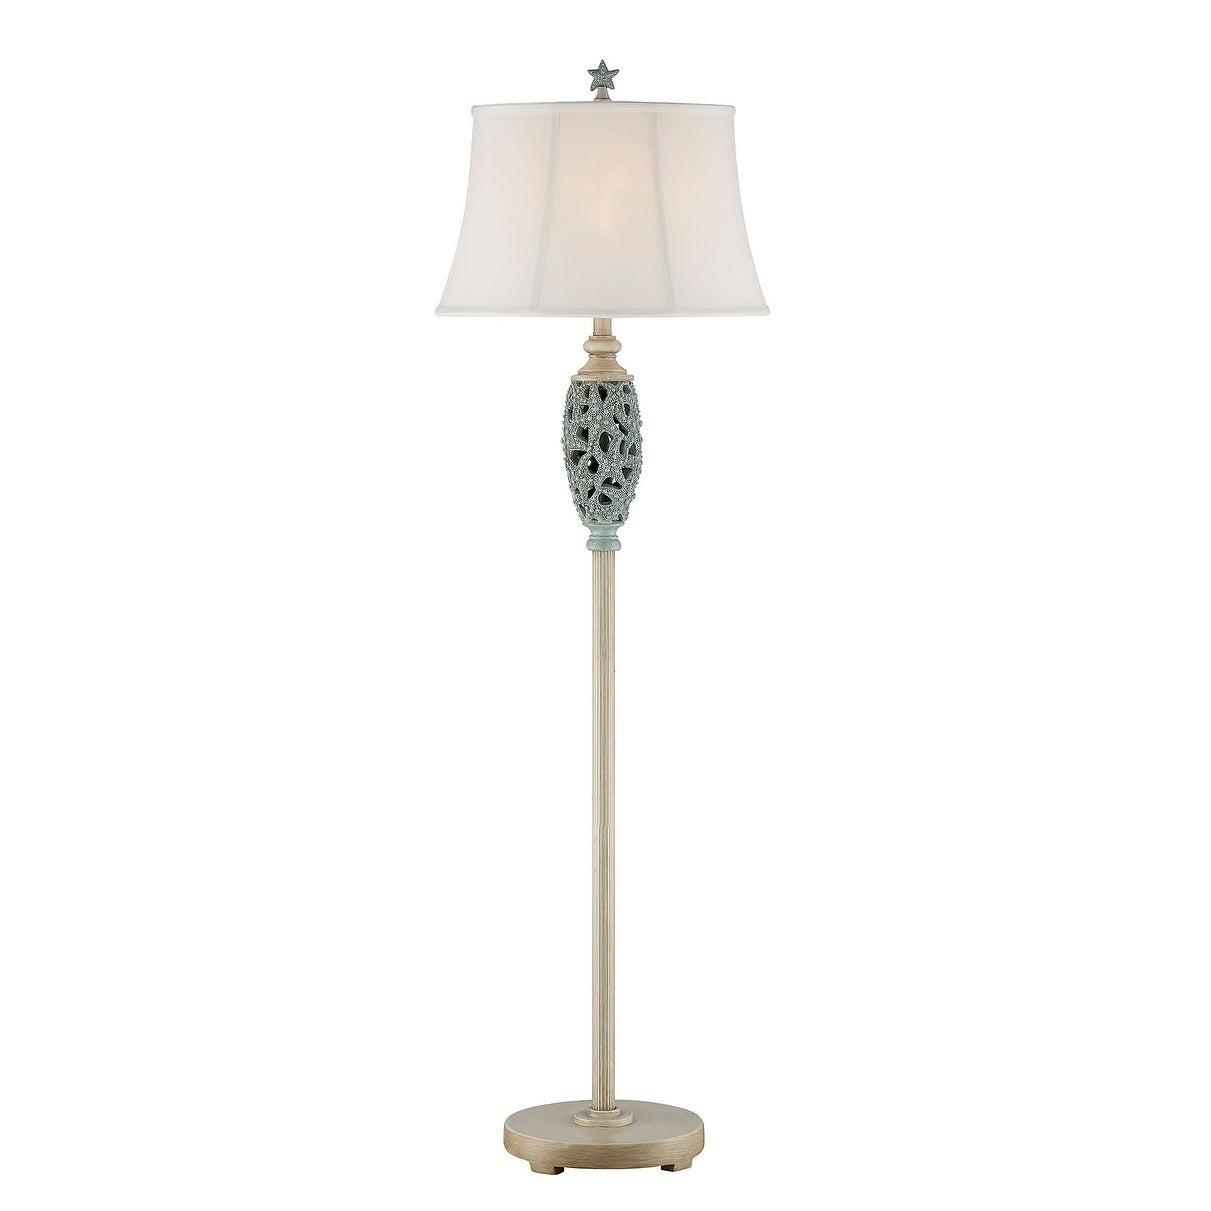 Seahaven Starfish Floor Lamp 64 High